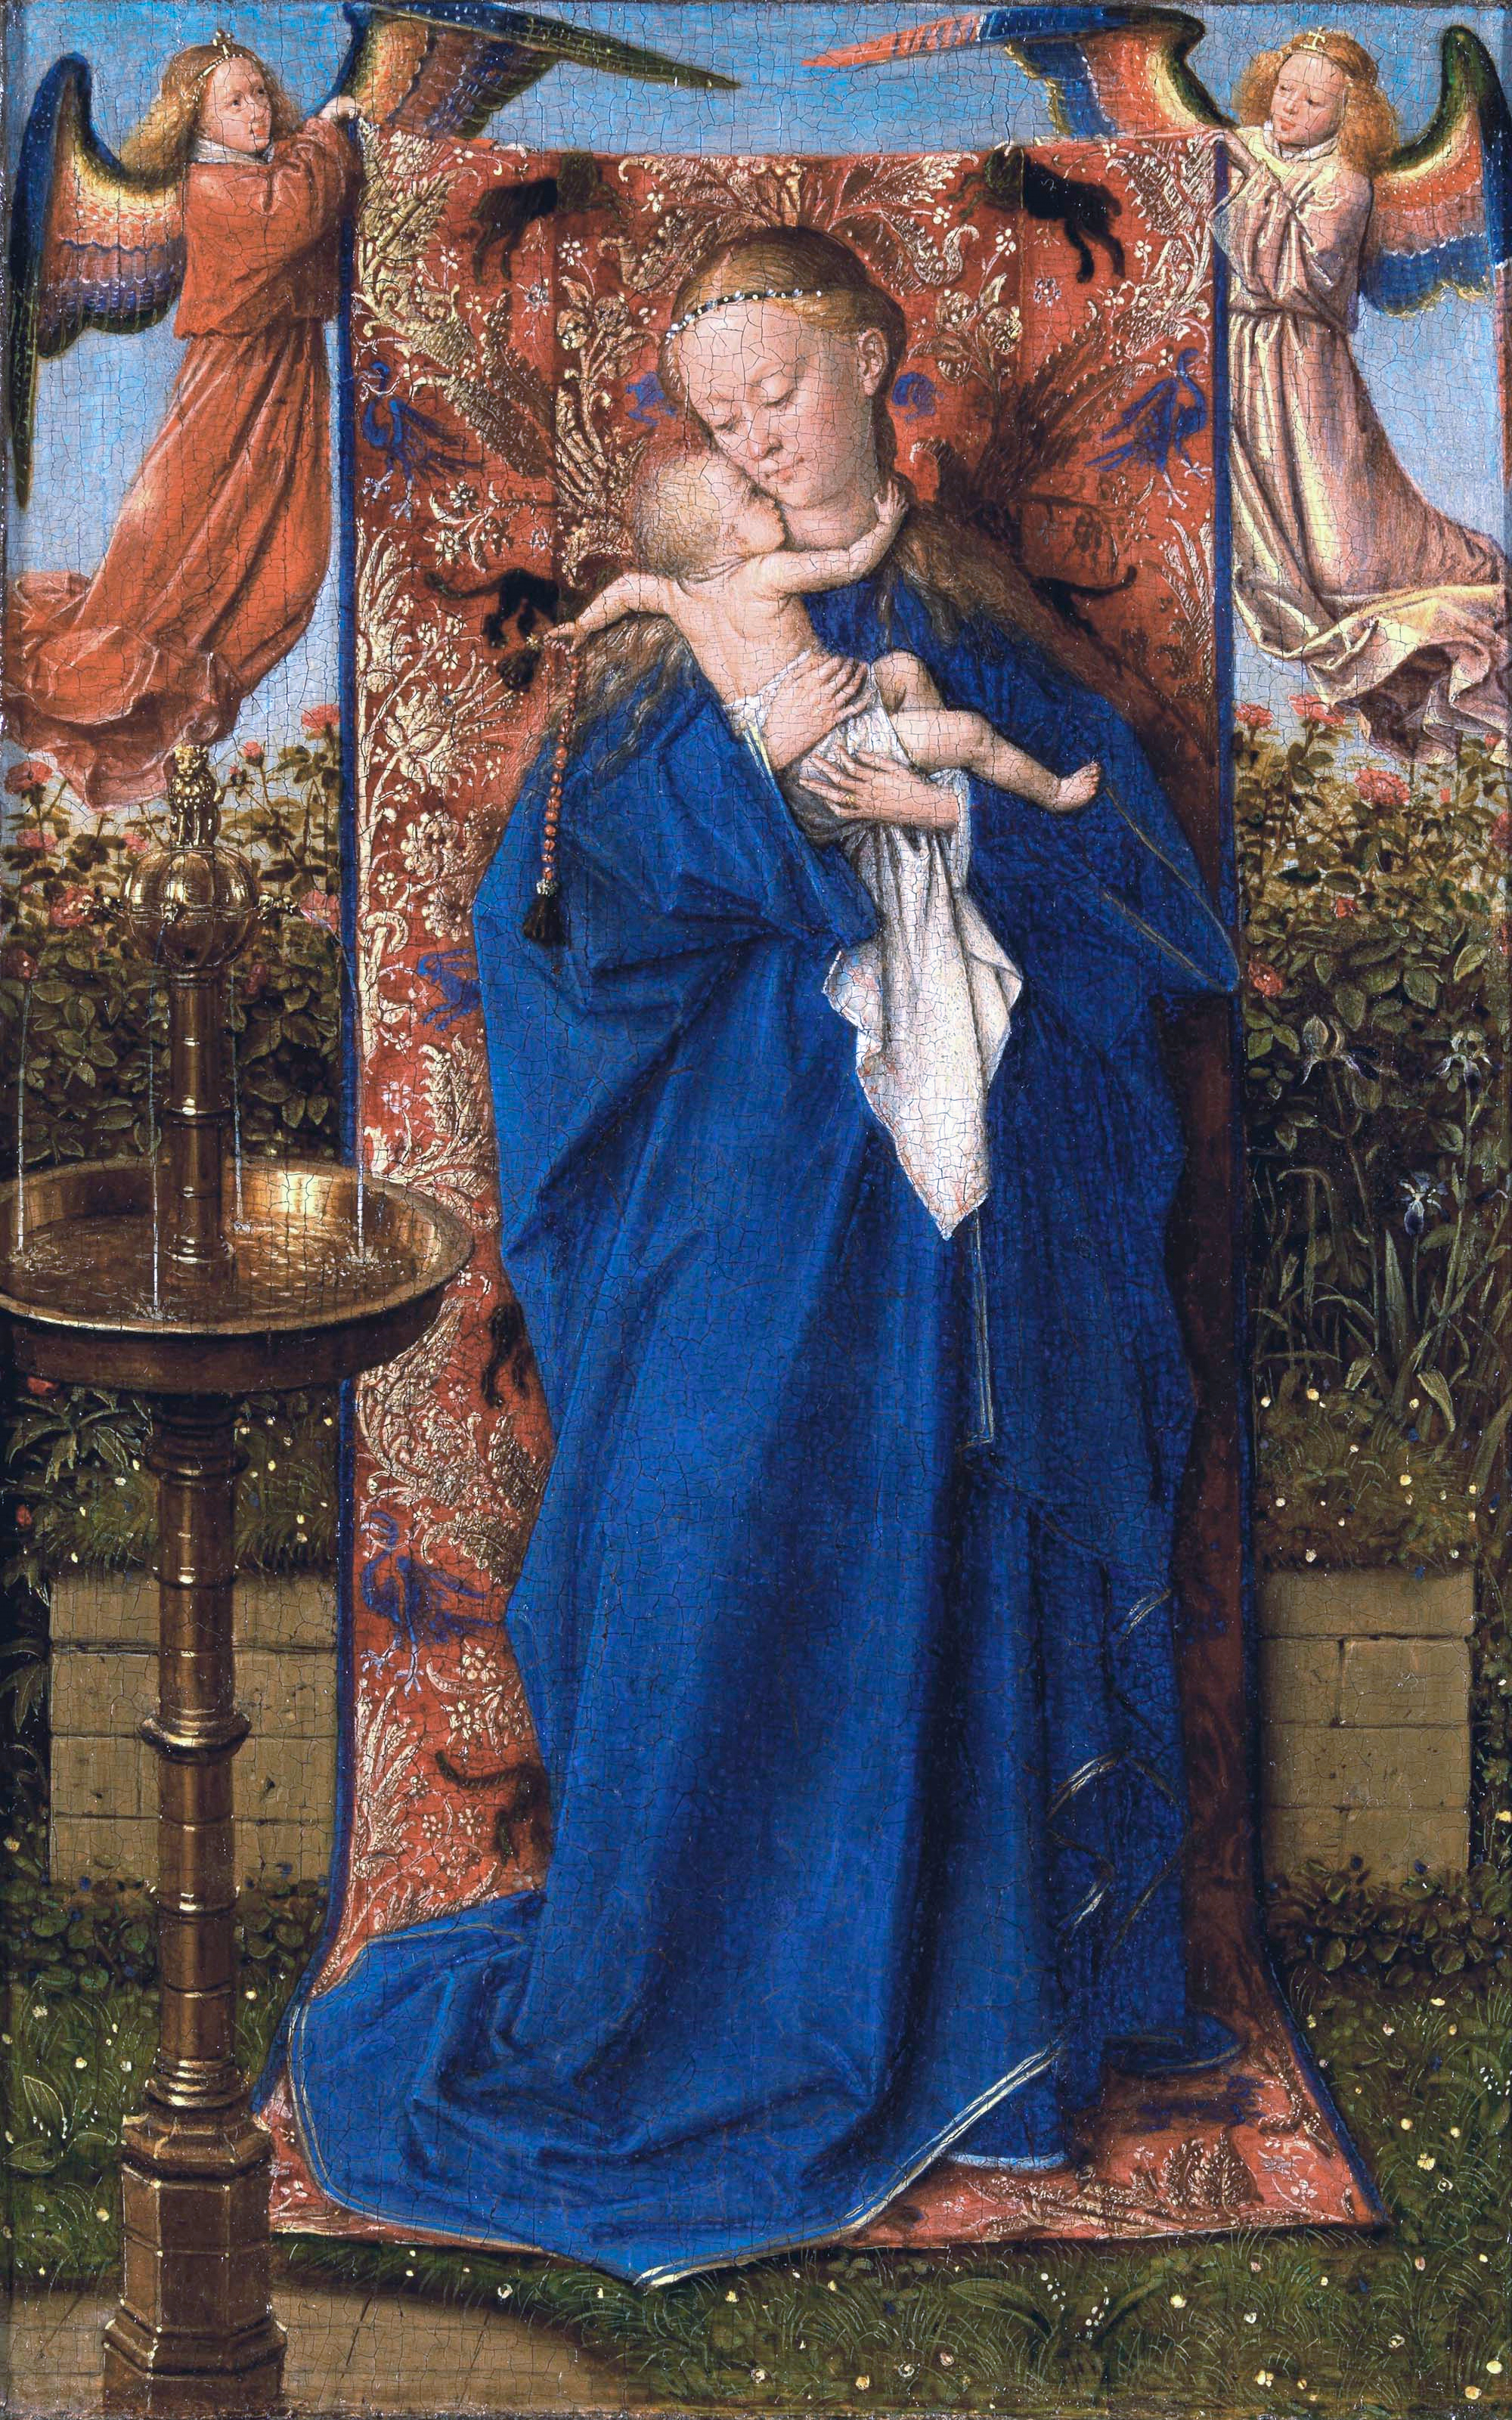 Goede File:Jan van Eyck - Madonna and Child at the Fountain - WGA7619 IK-87